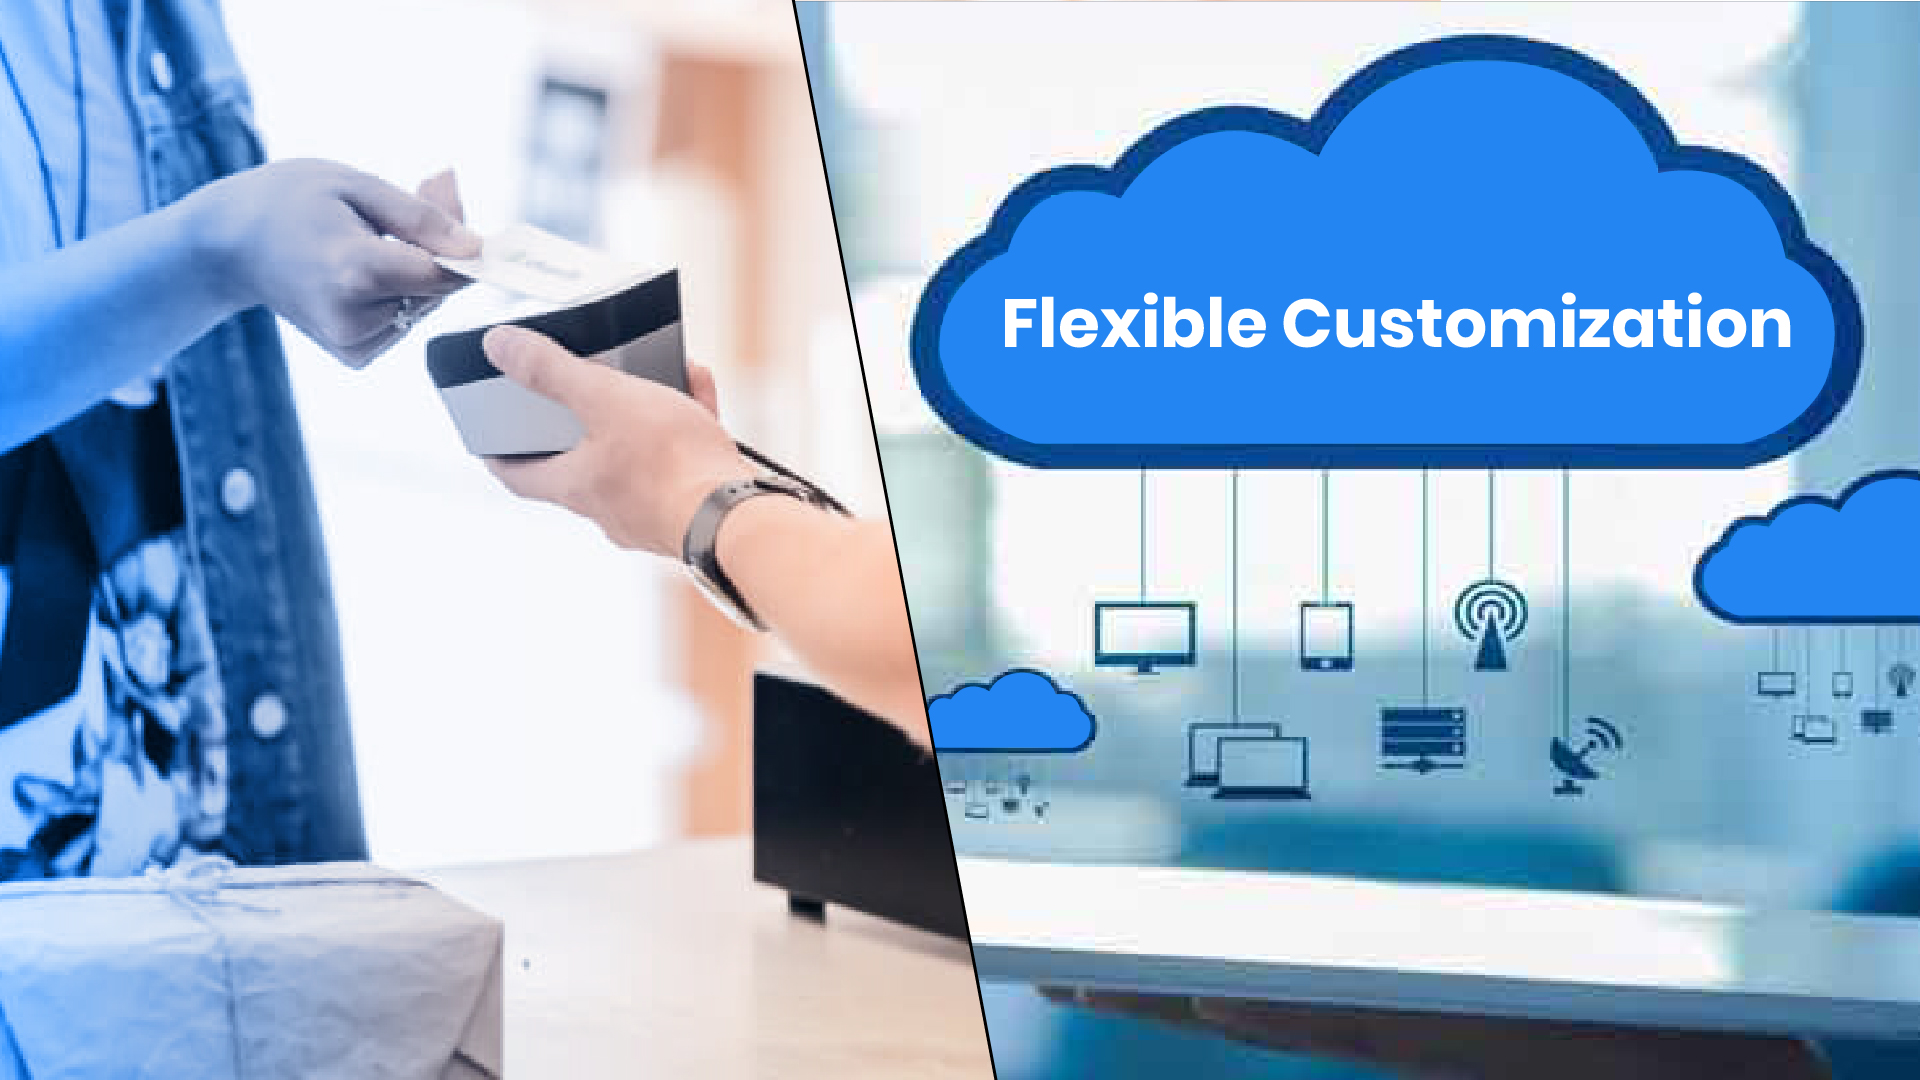 Flexible customization